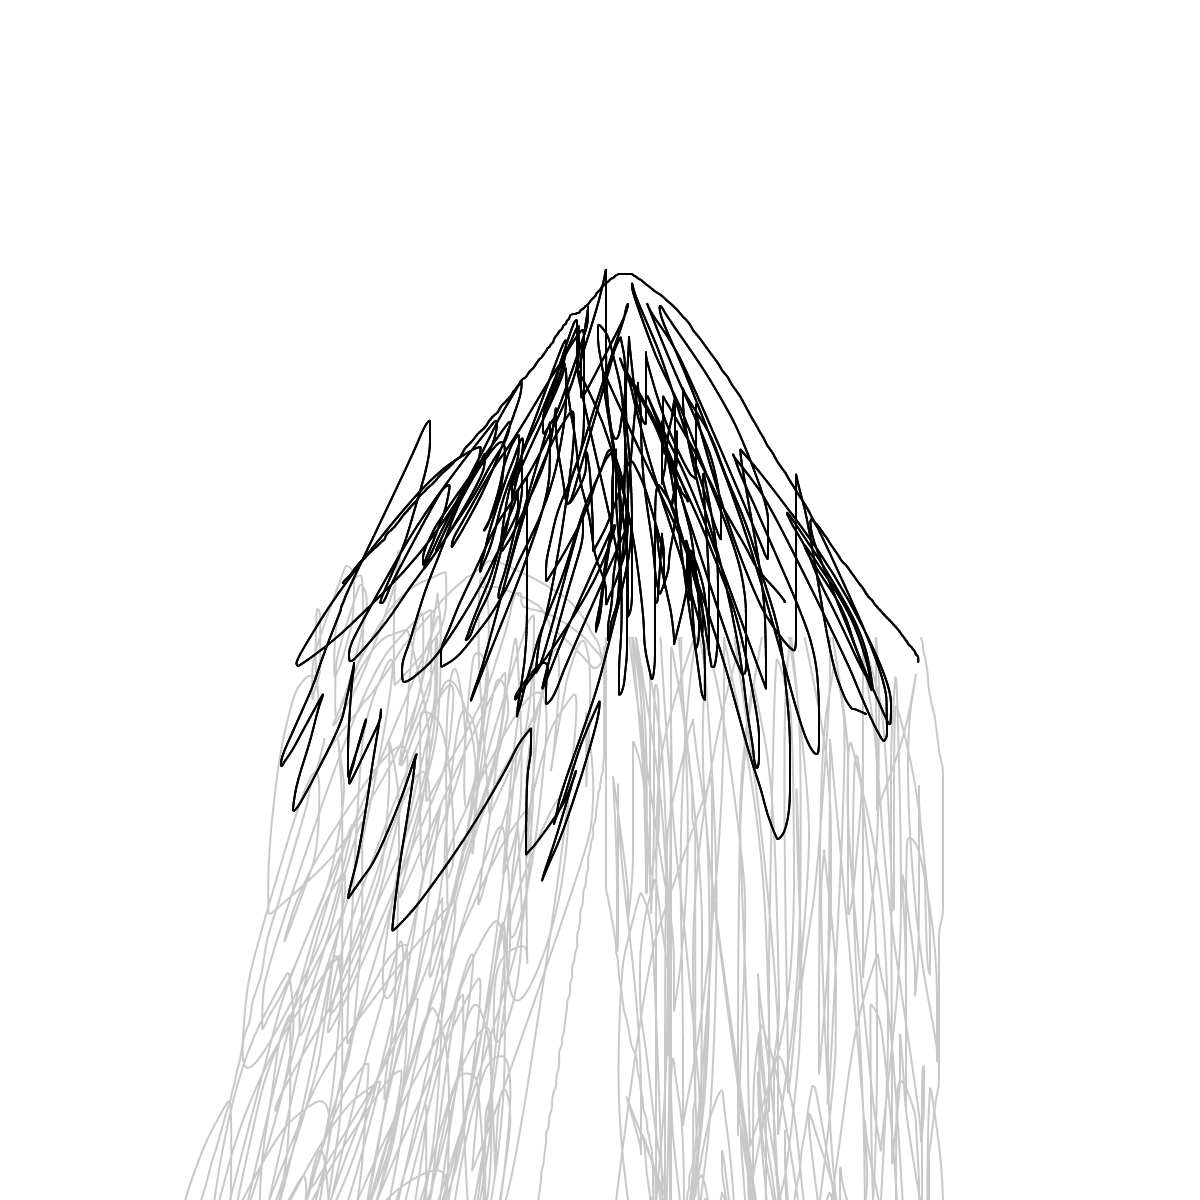 BAAAM drawing#11455 lat:52.4758987426757800lng: 13.4056529998779300